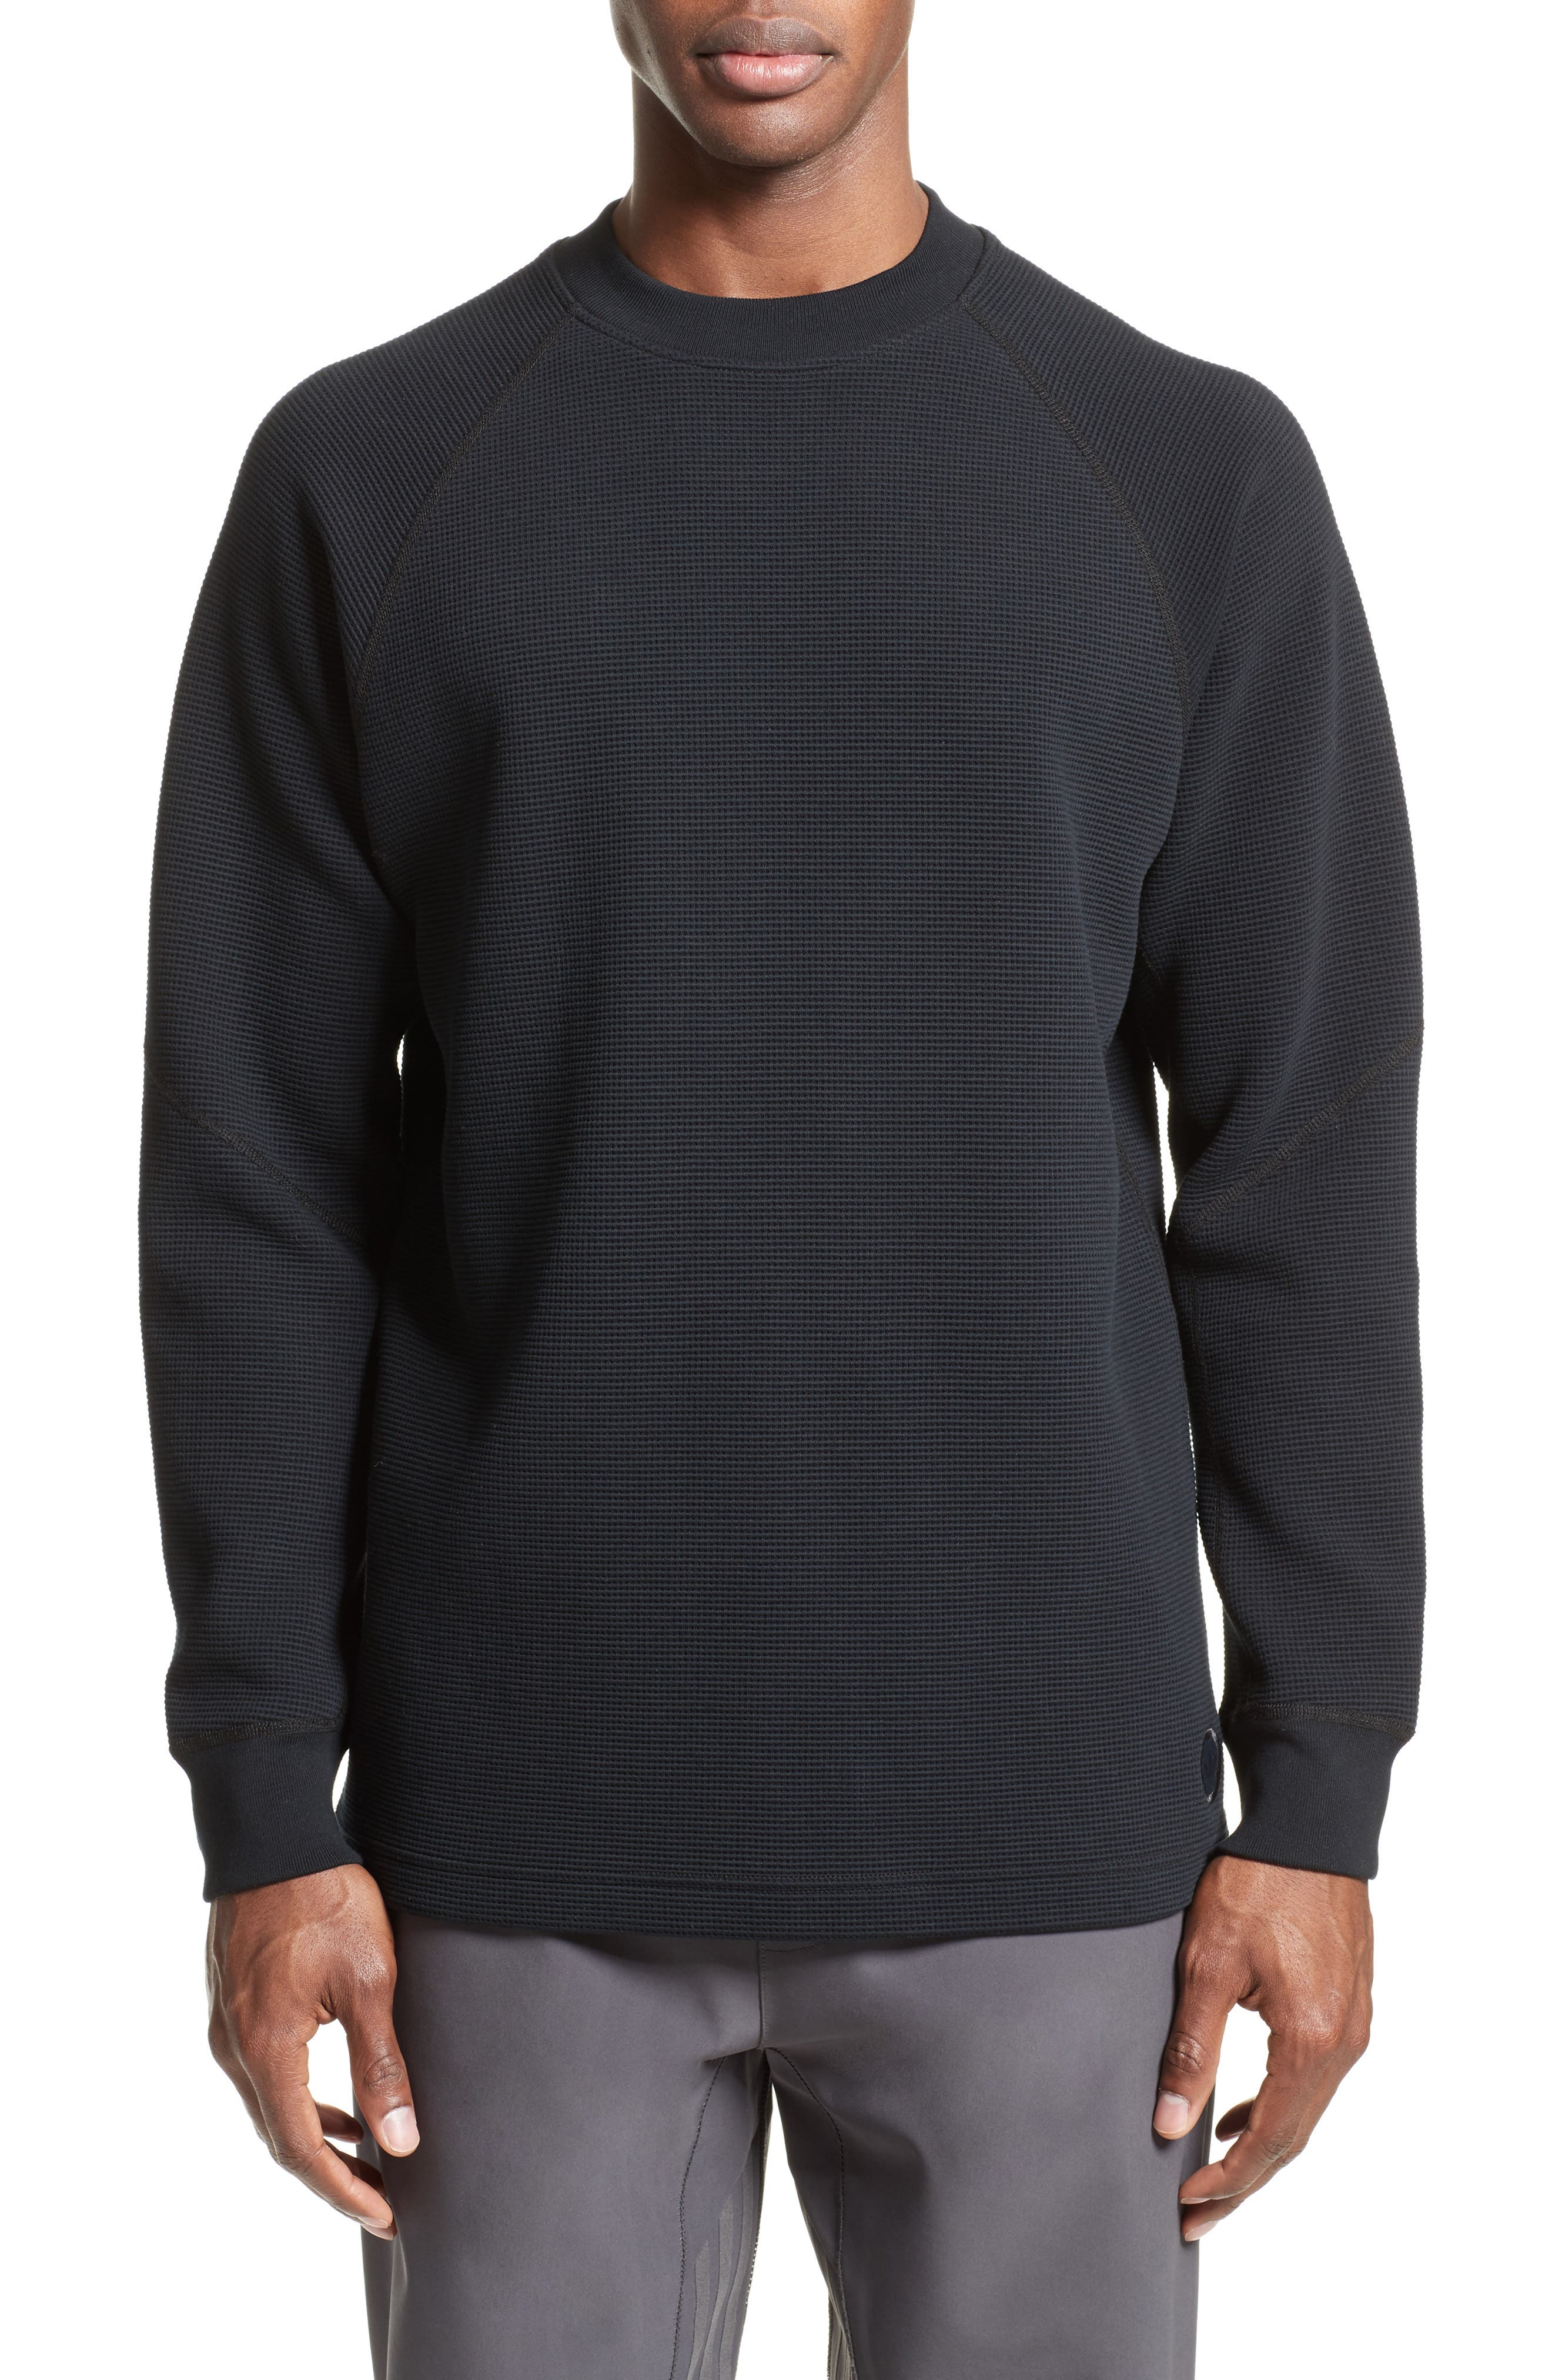 Fisherman Crewneck Sweatshirt,                         Main,                         color, Black